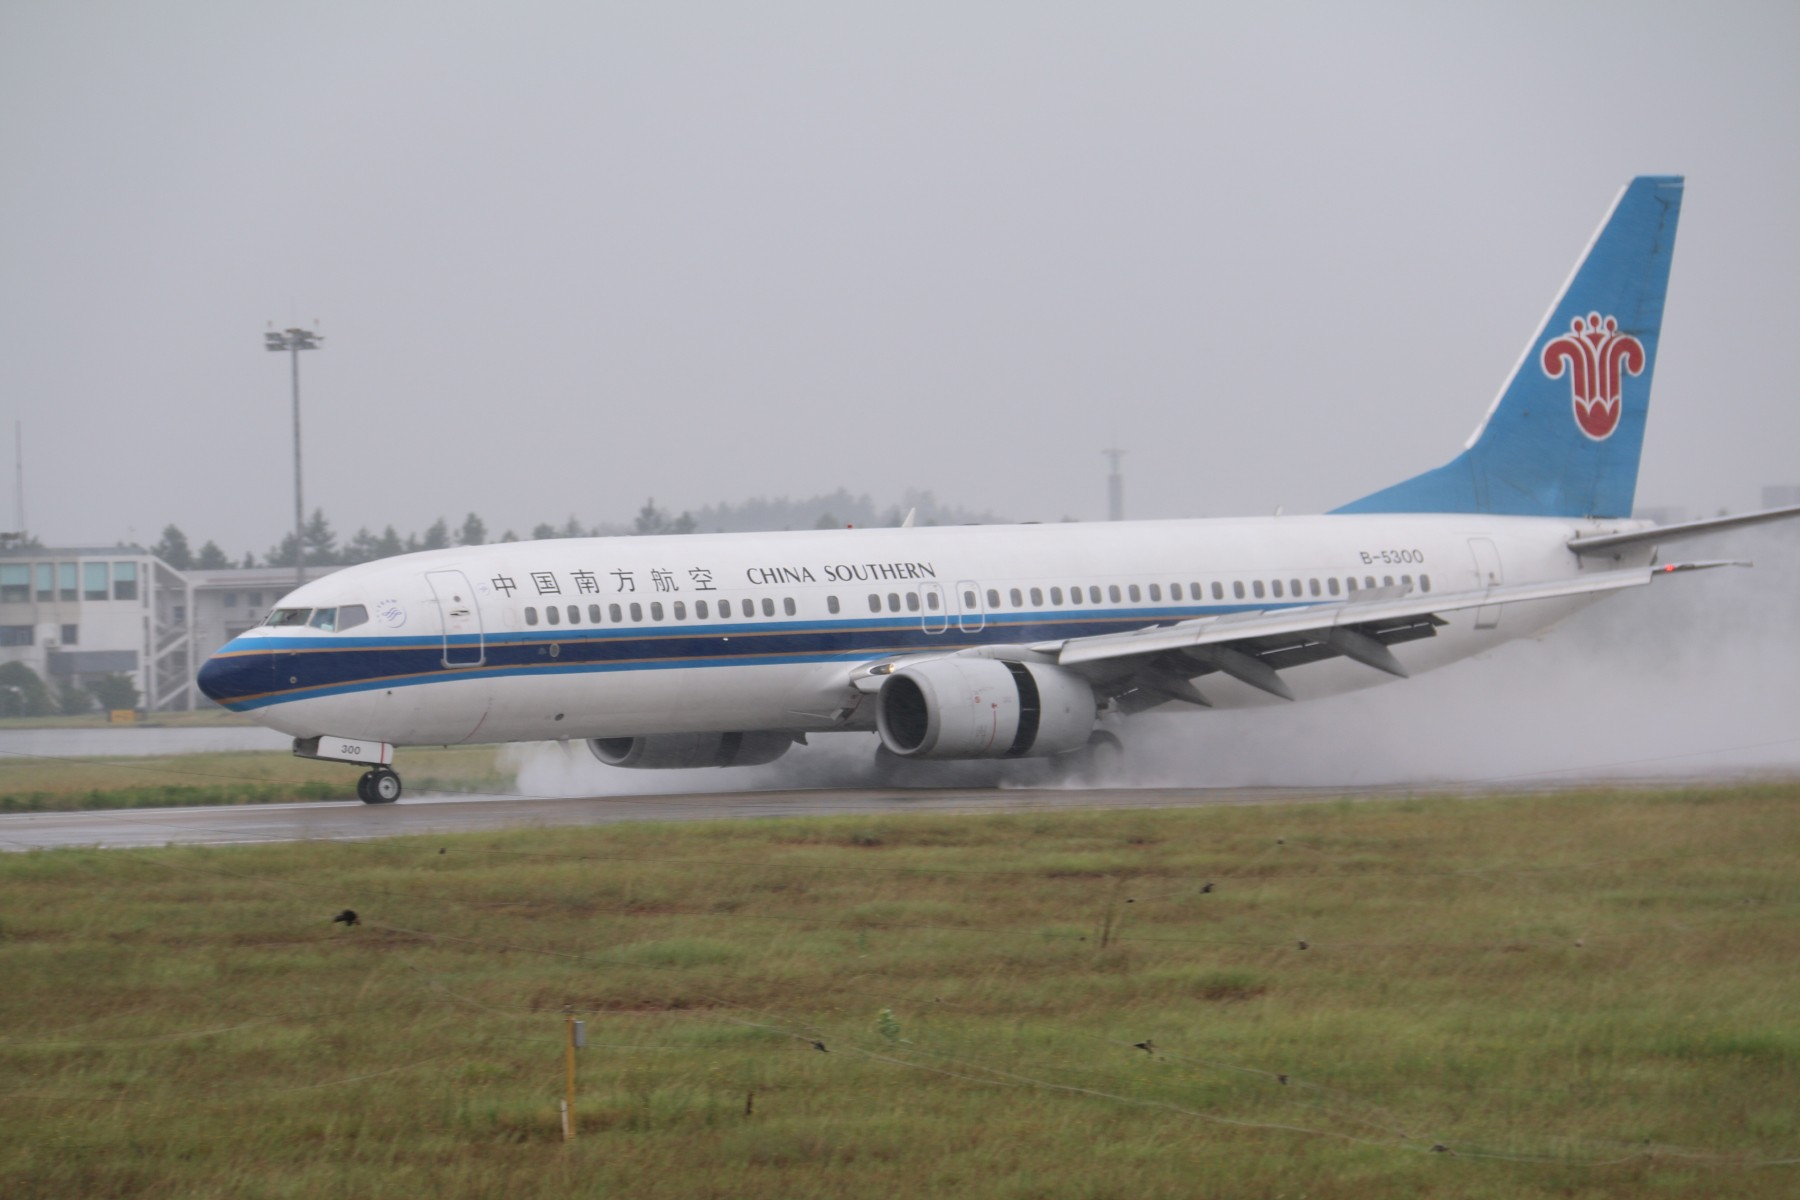 Re:[原创]【南昌飞友会】【1800*1200】暴雨大风中的KHN [17pic] BOEING 737-800 B-5300 中国南昌昌北国际机场